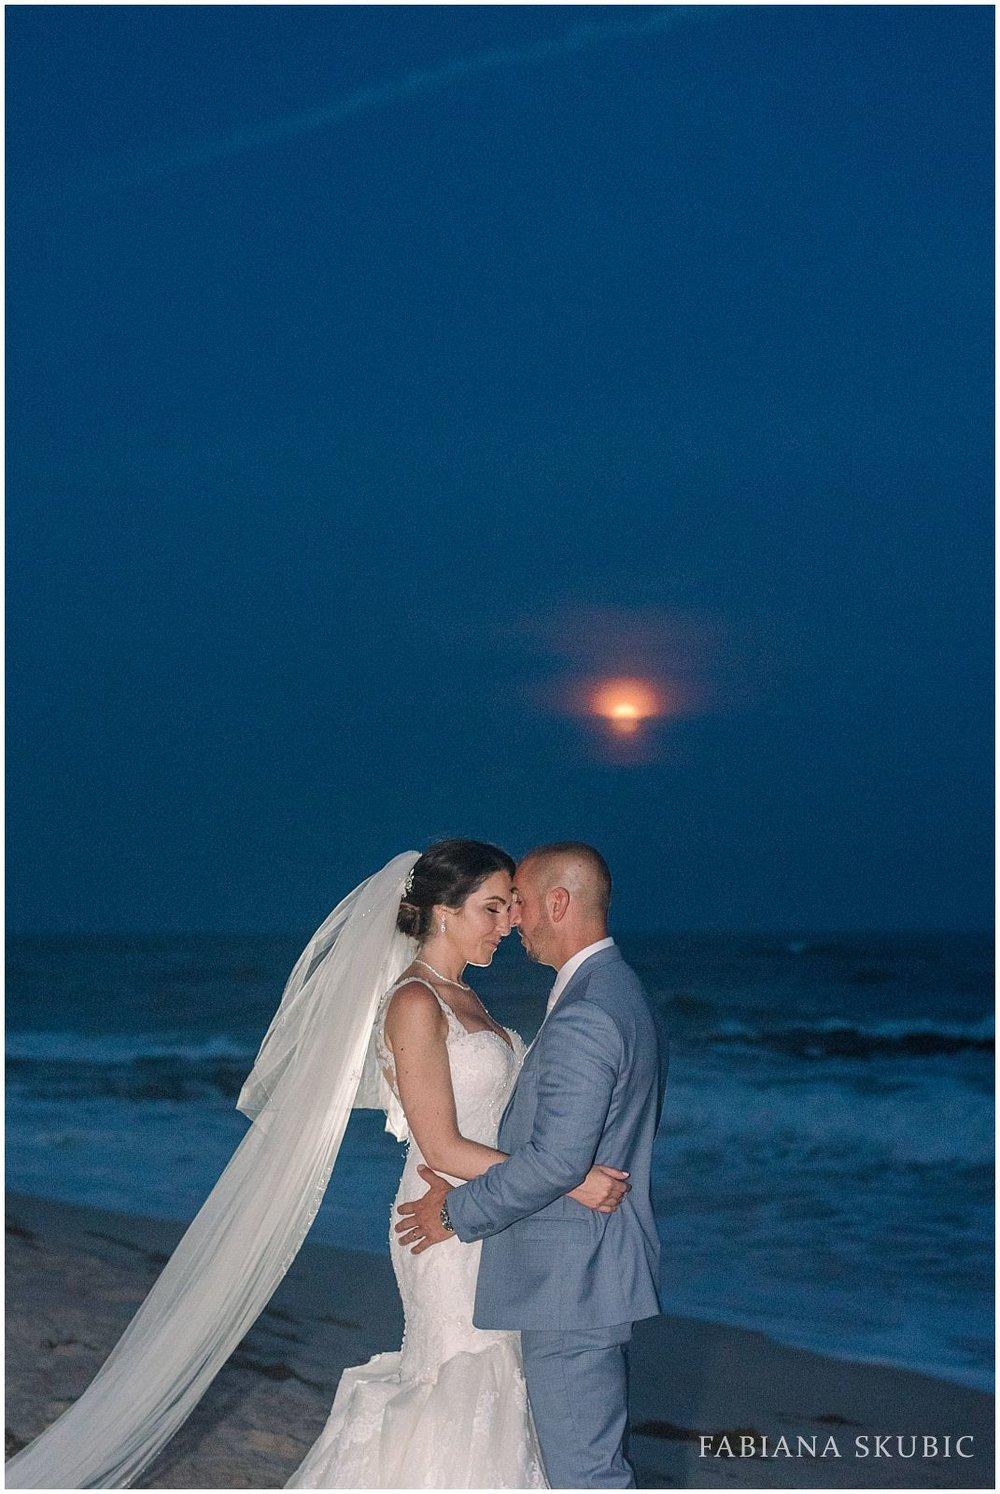 FabianaSkubic_J&M_Oceanbleu_Wedding_0126.jpg